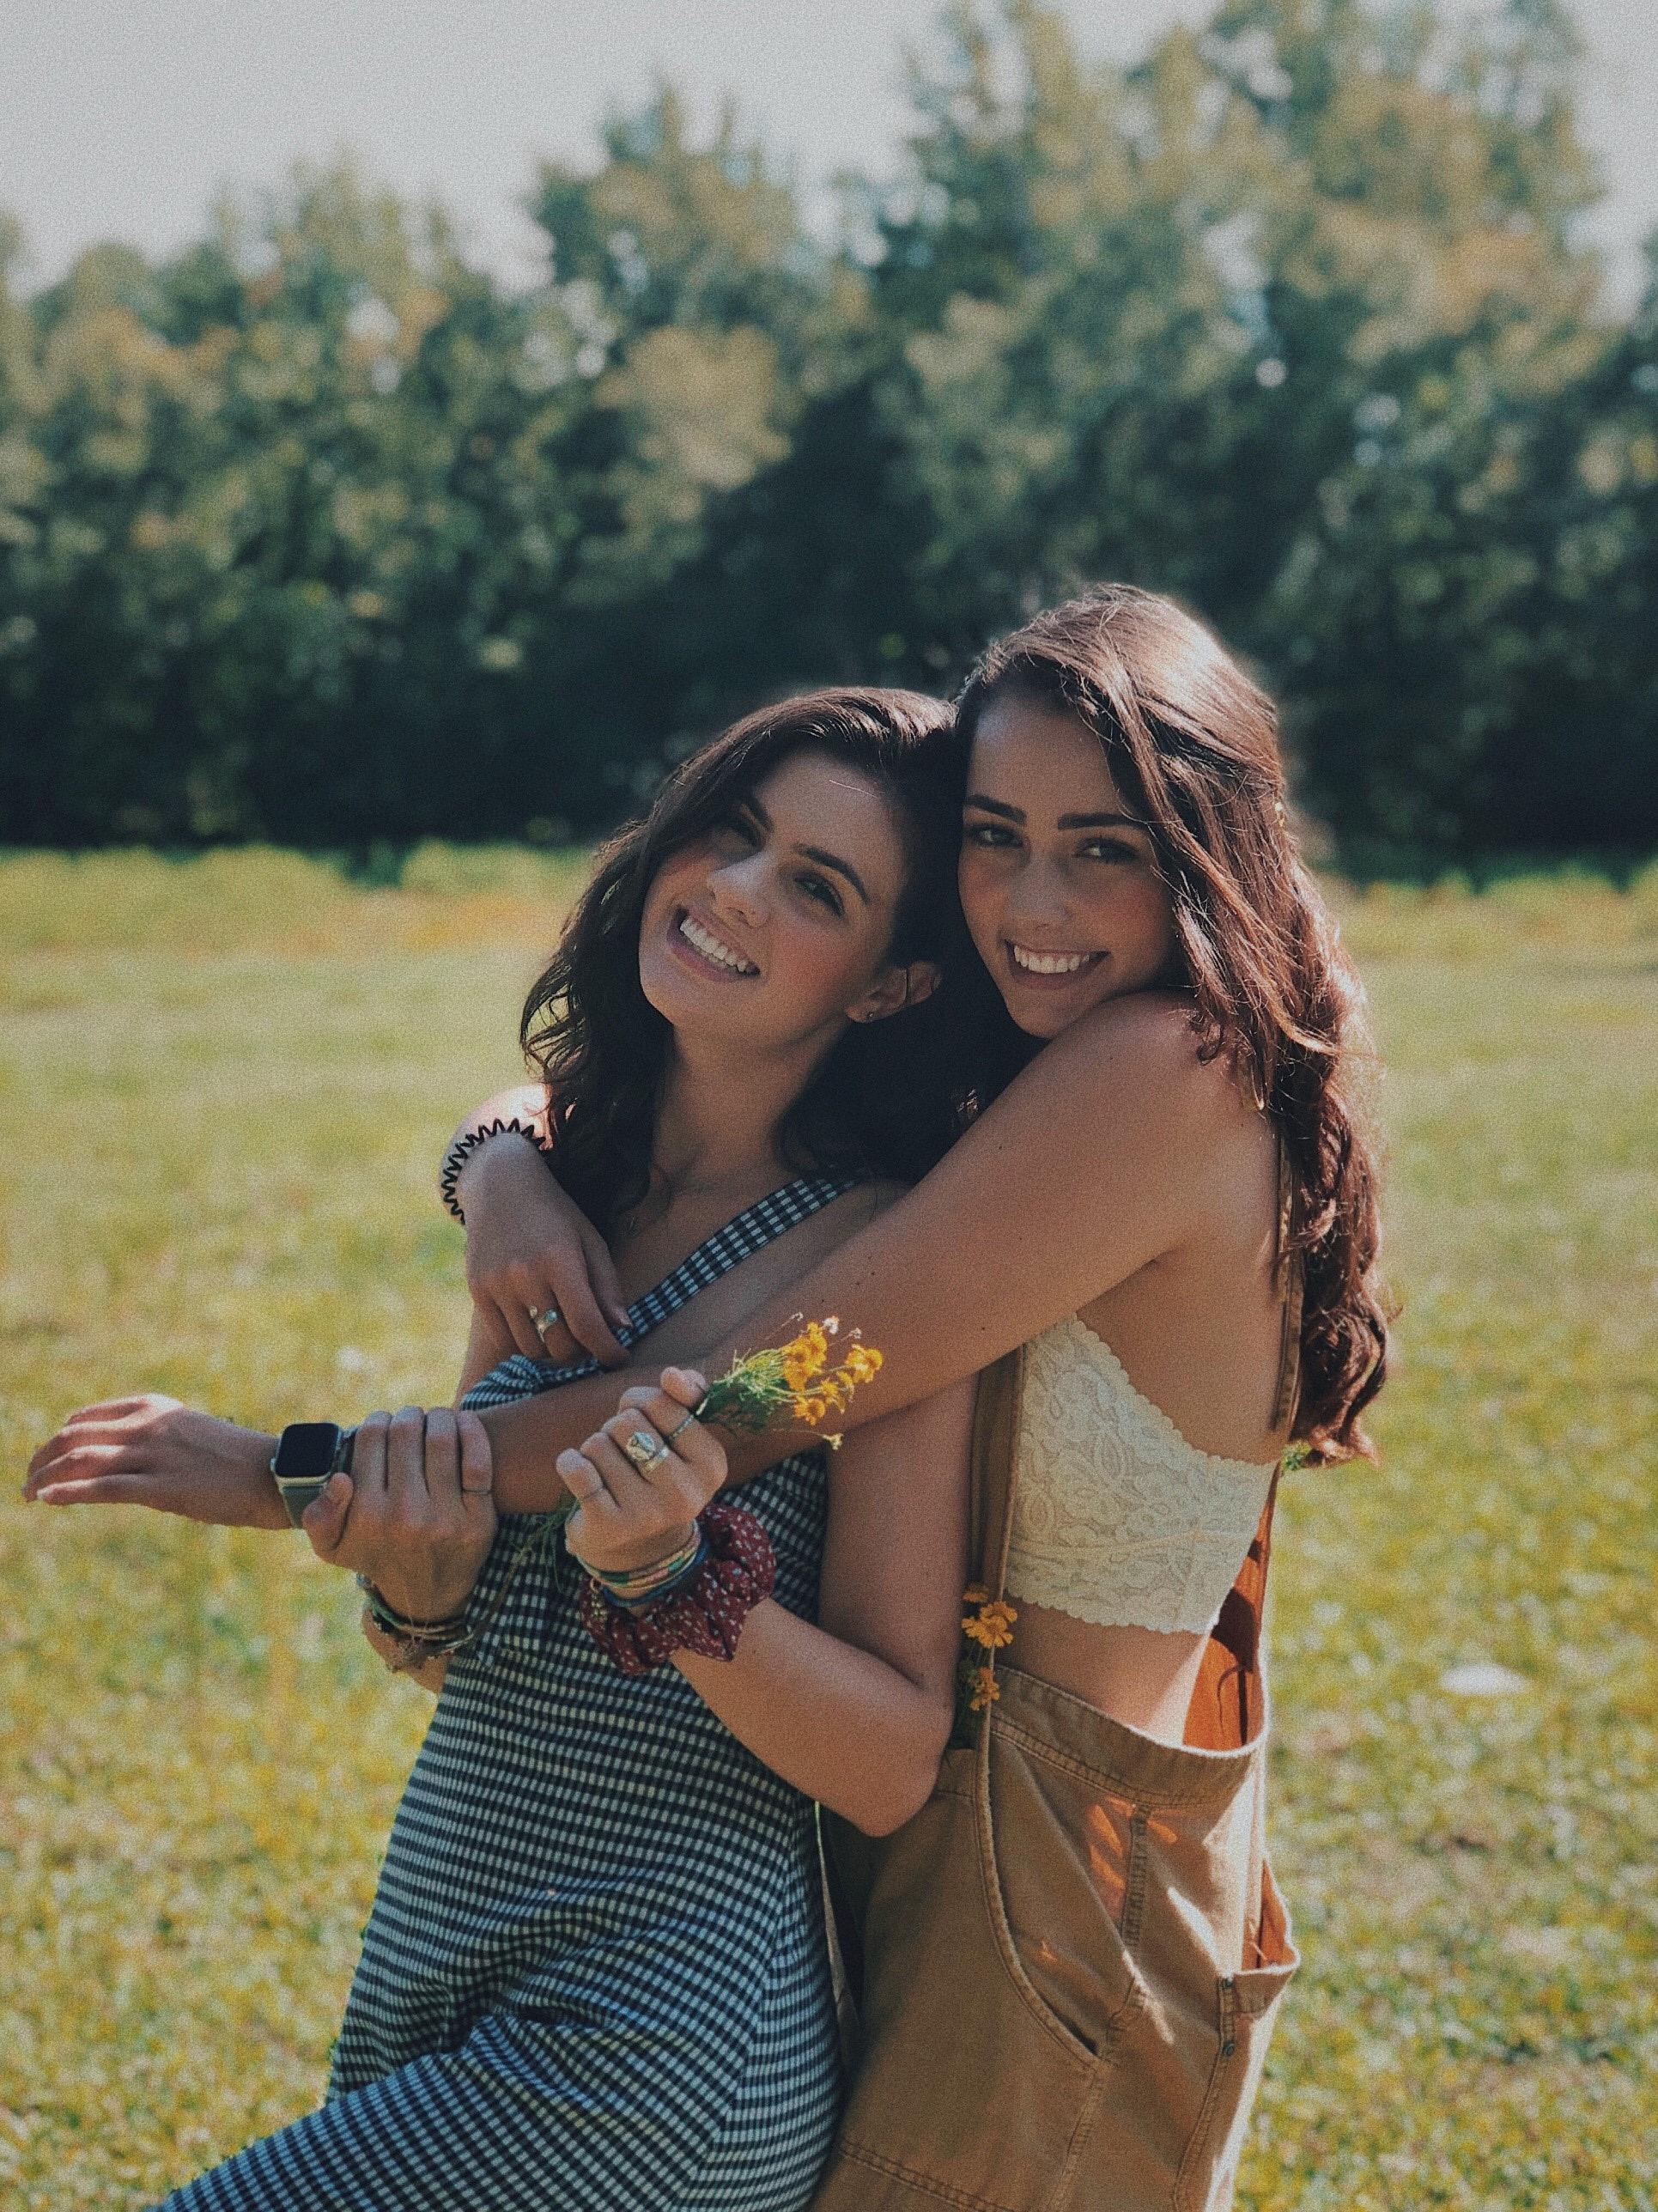 hai cô gái ôm nhau tuoi cười